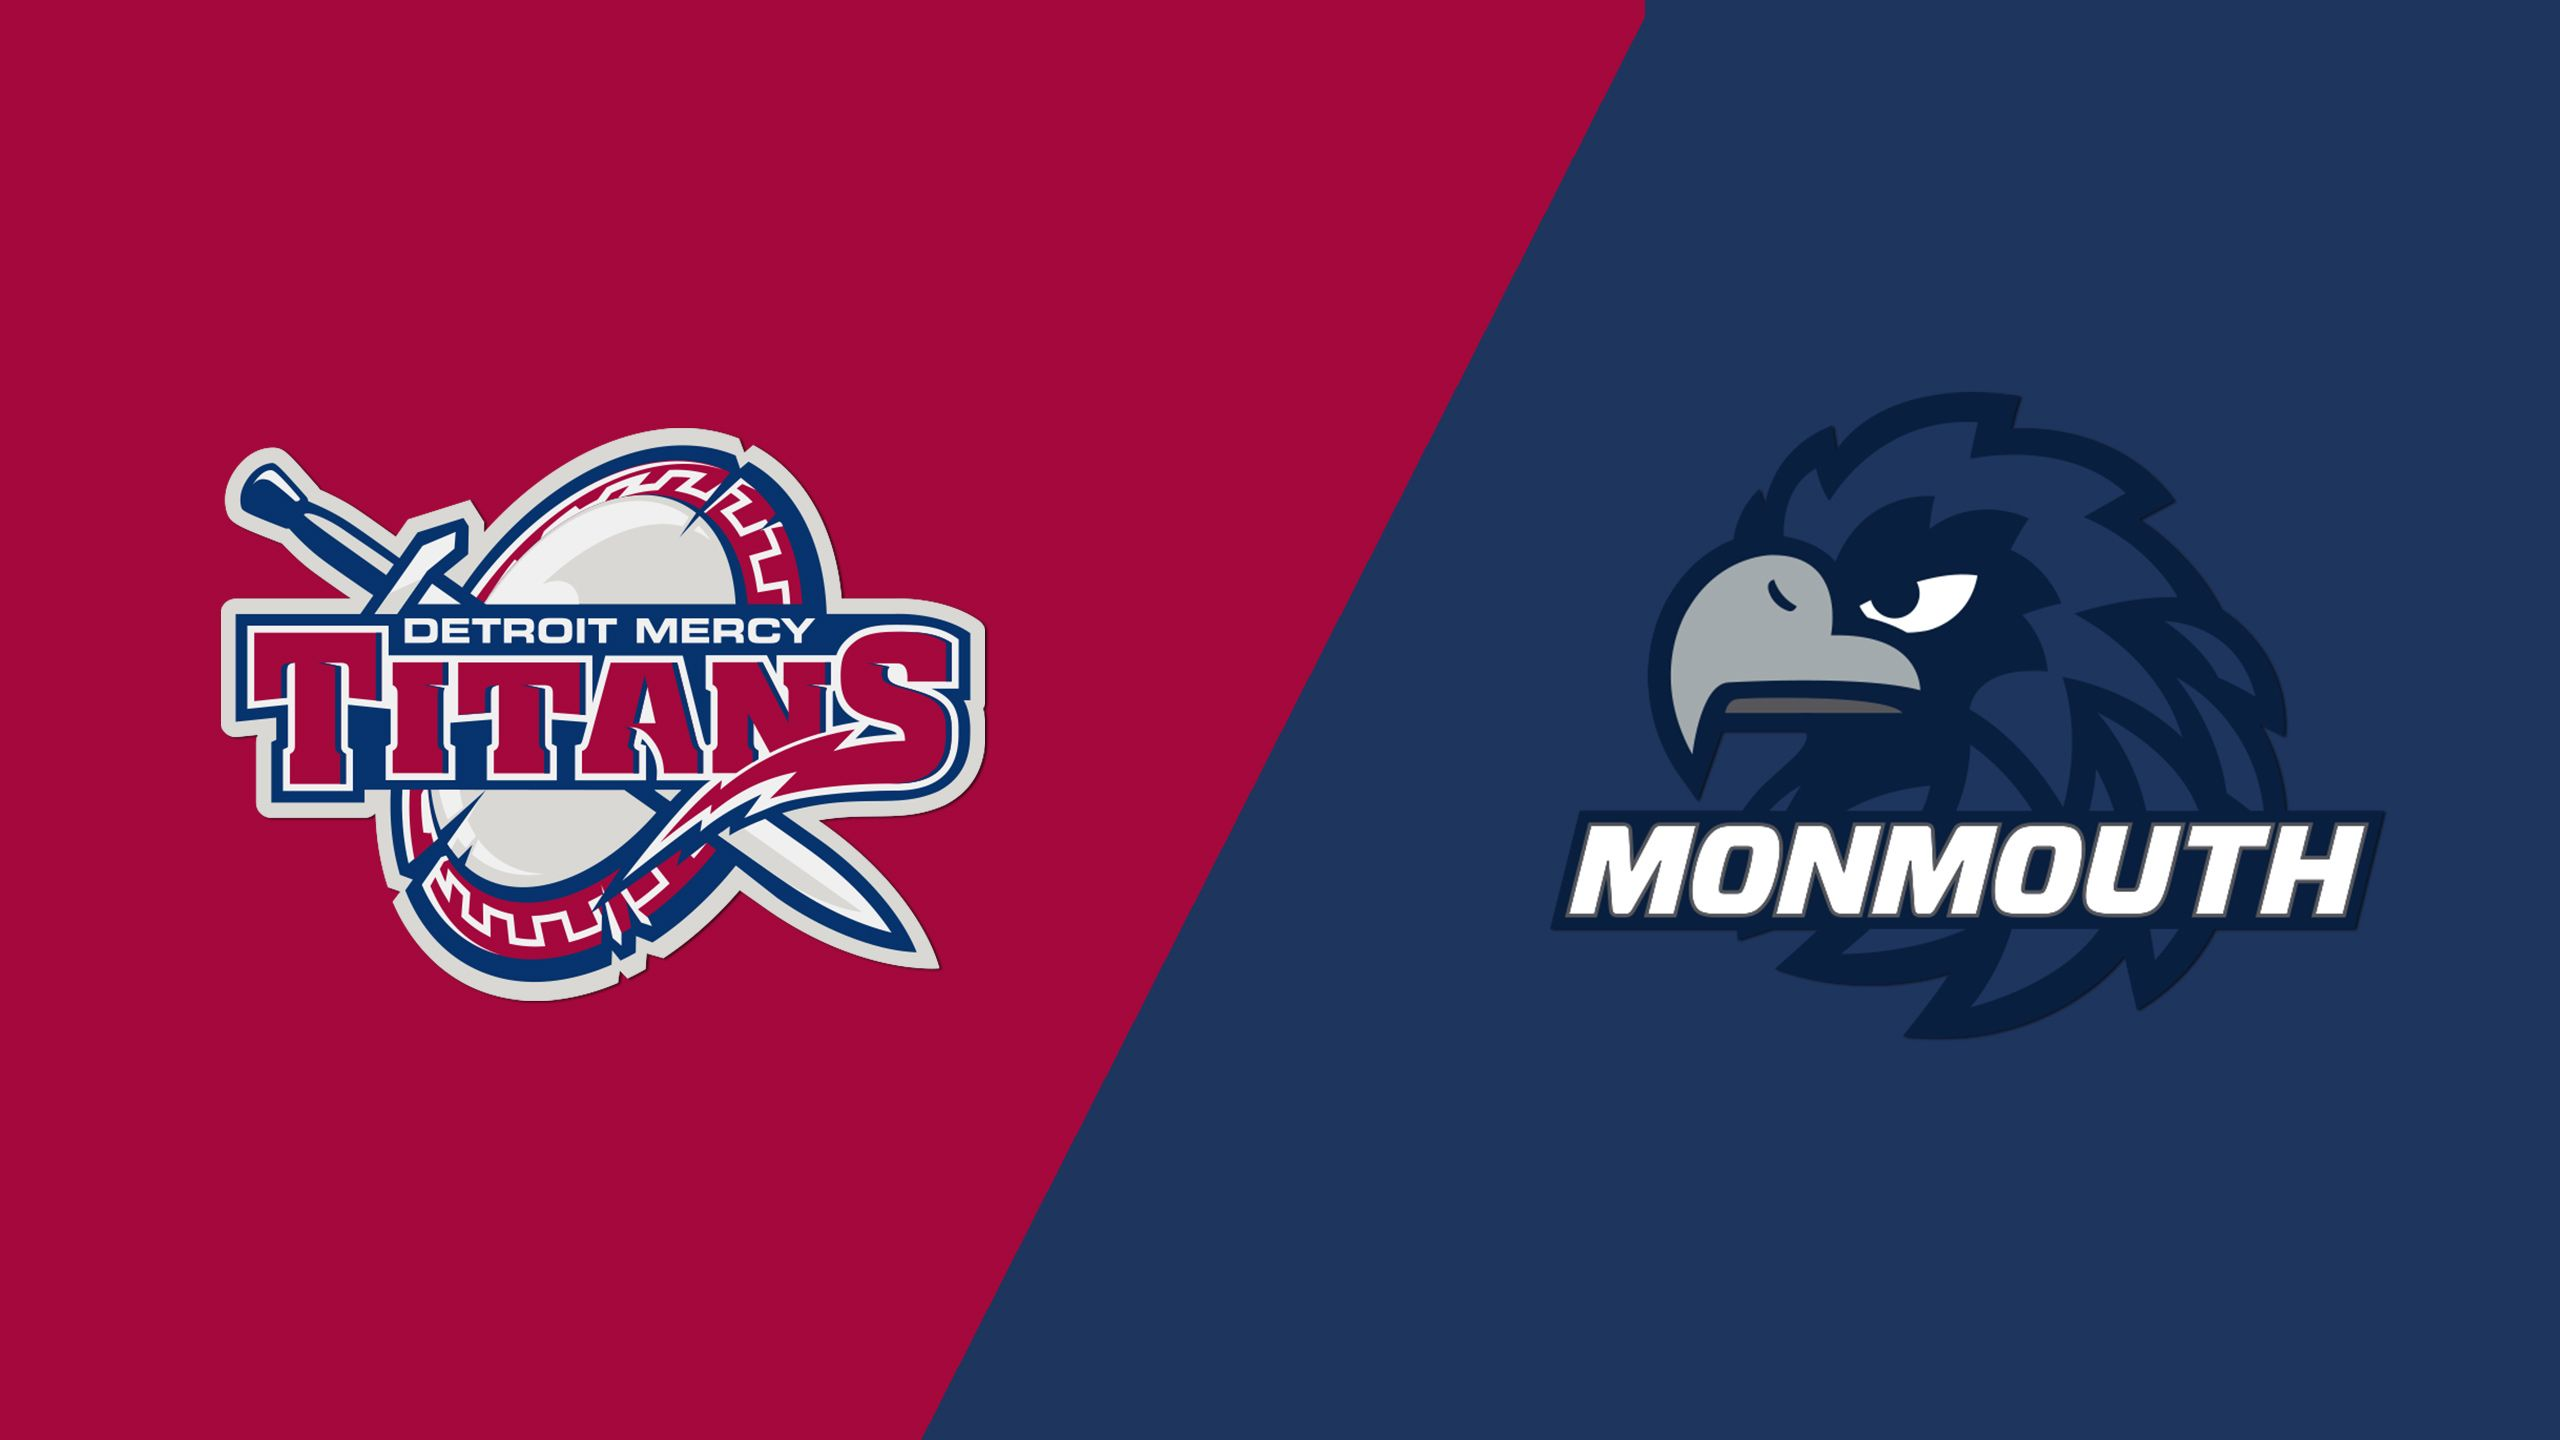 Detroit Mercy vs. Monmouth (M Lacrosse)